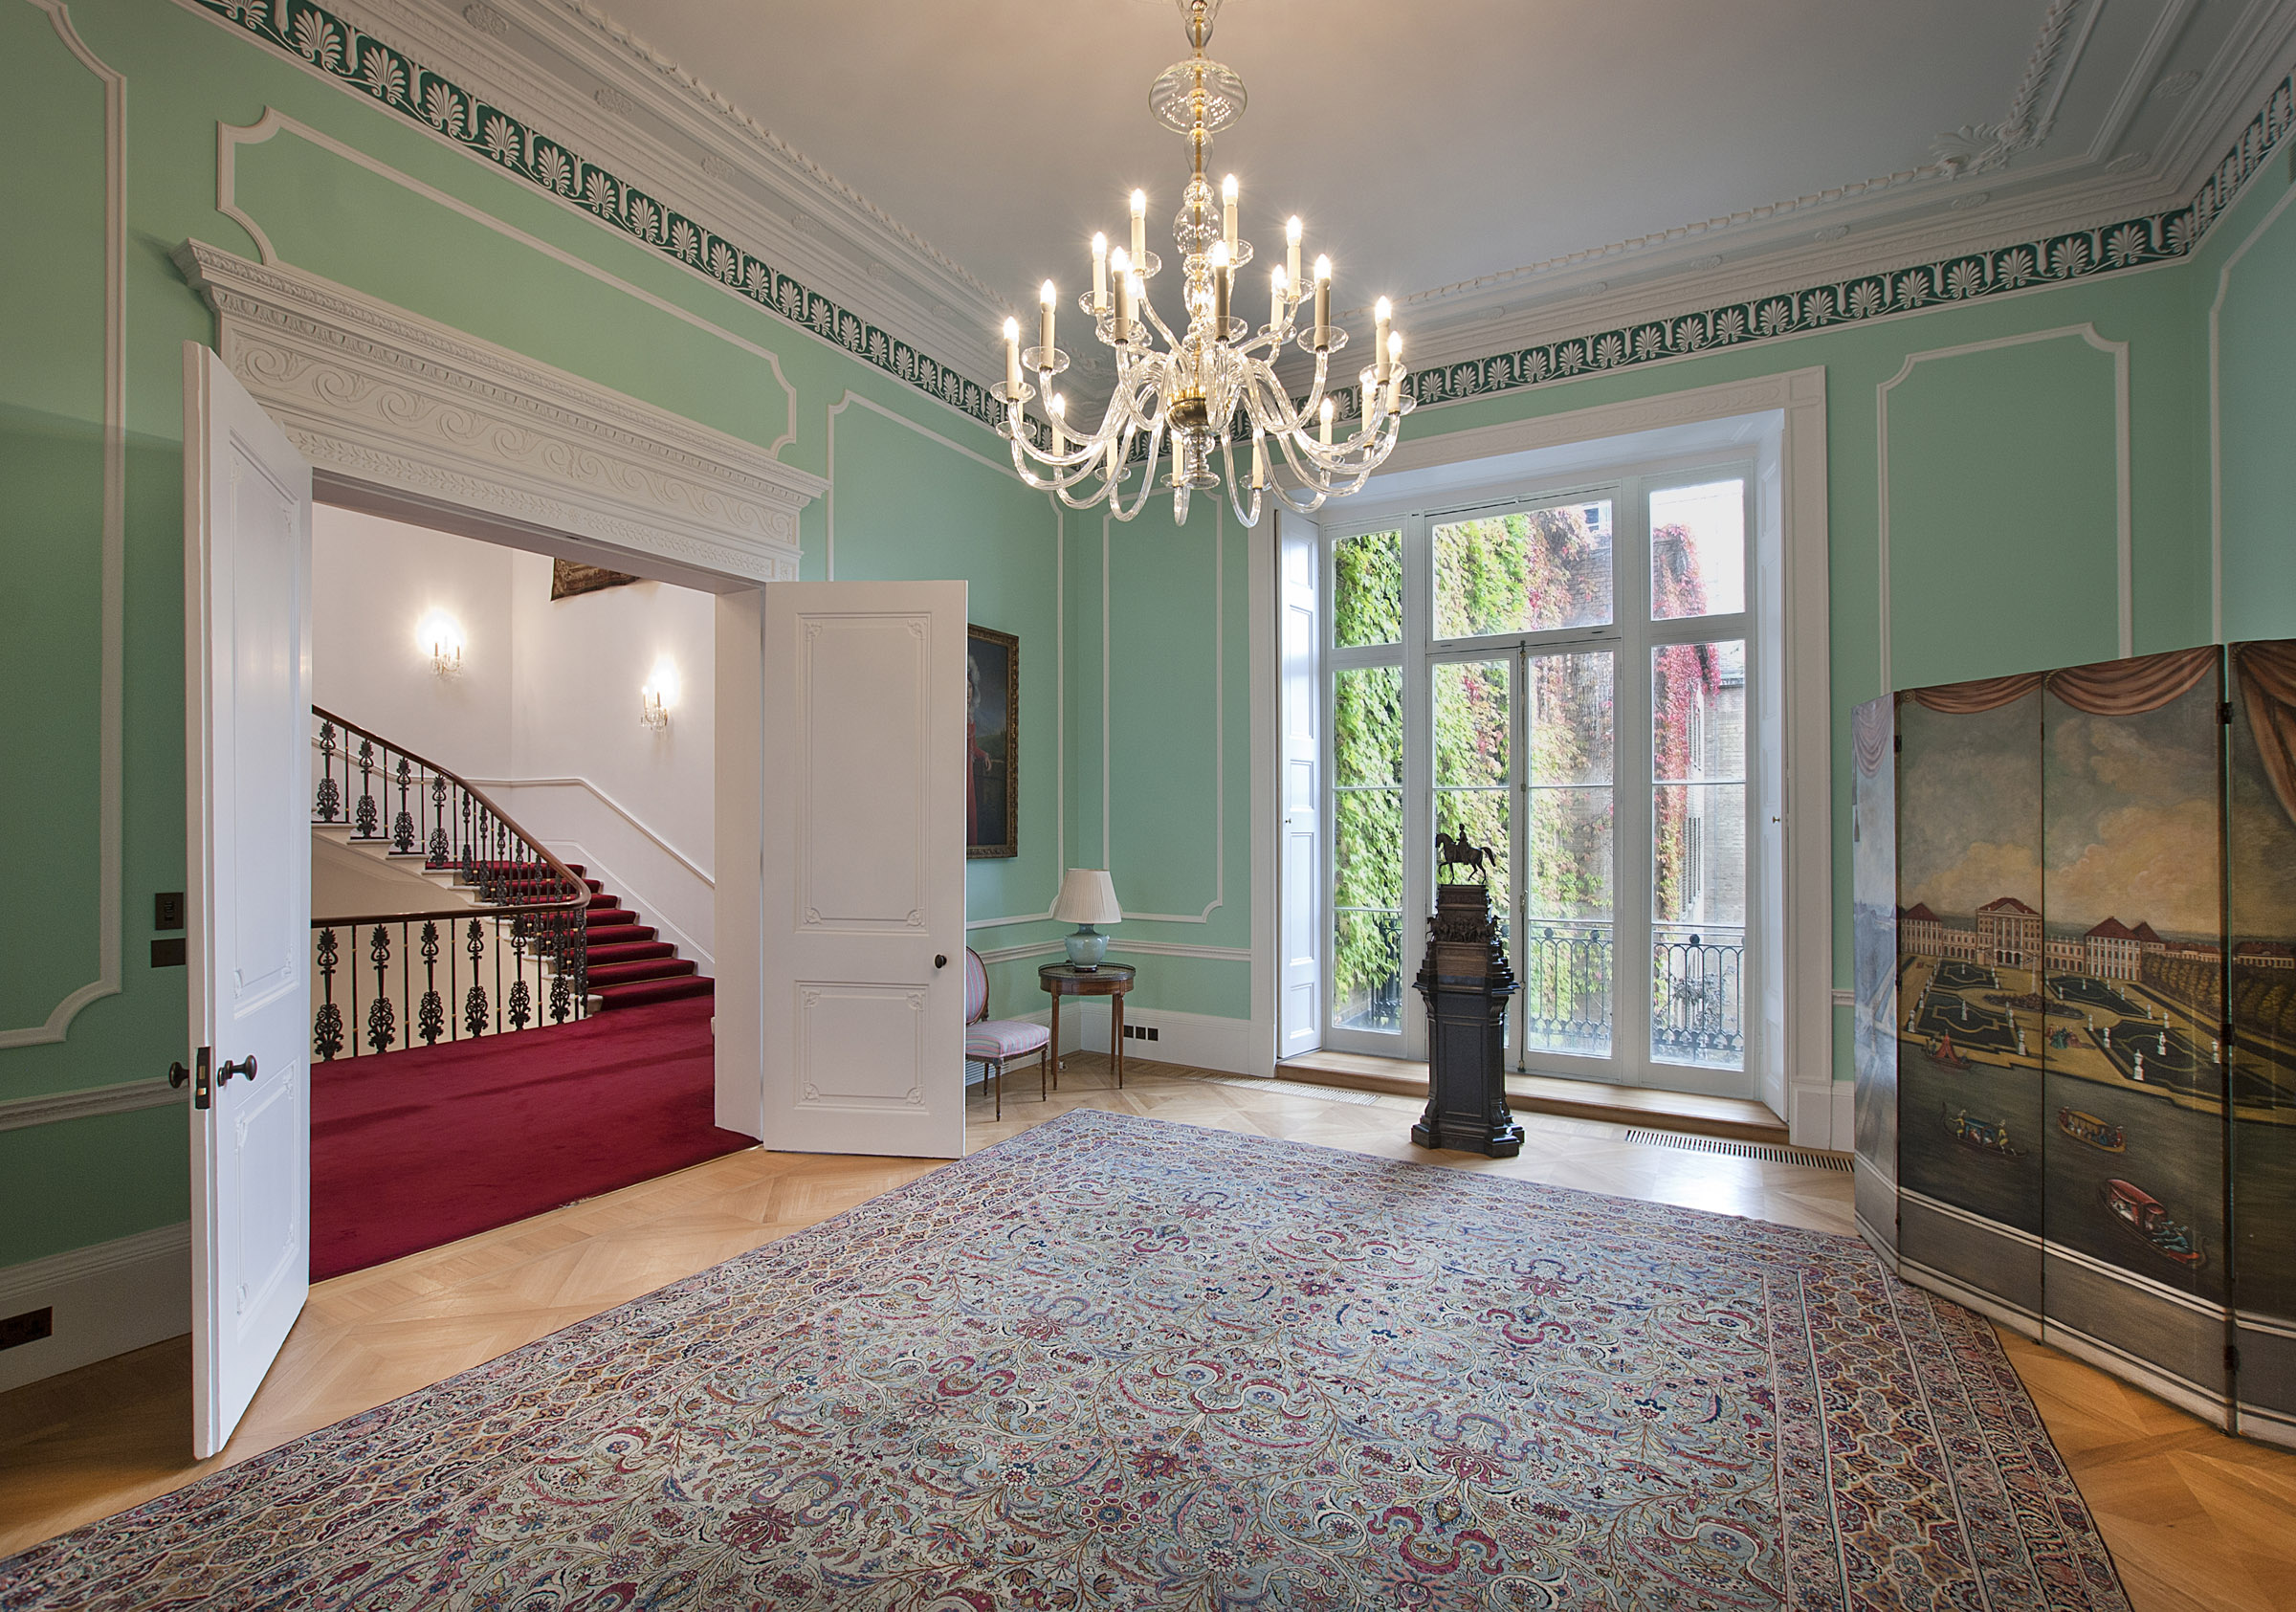 Green Room, German Embassy Residence, London